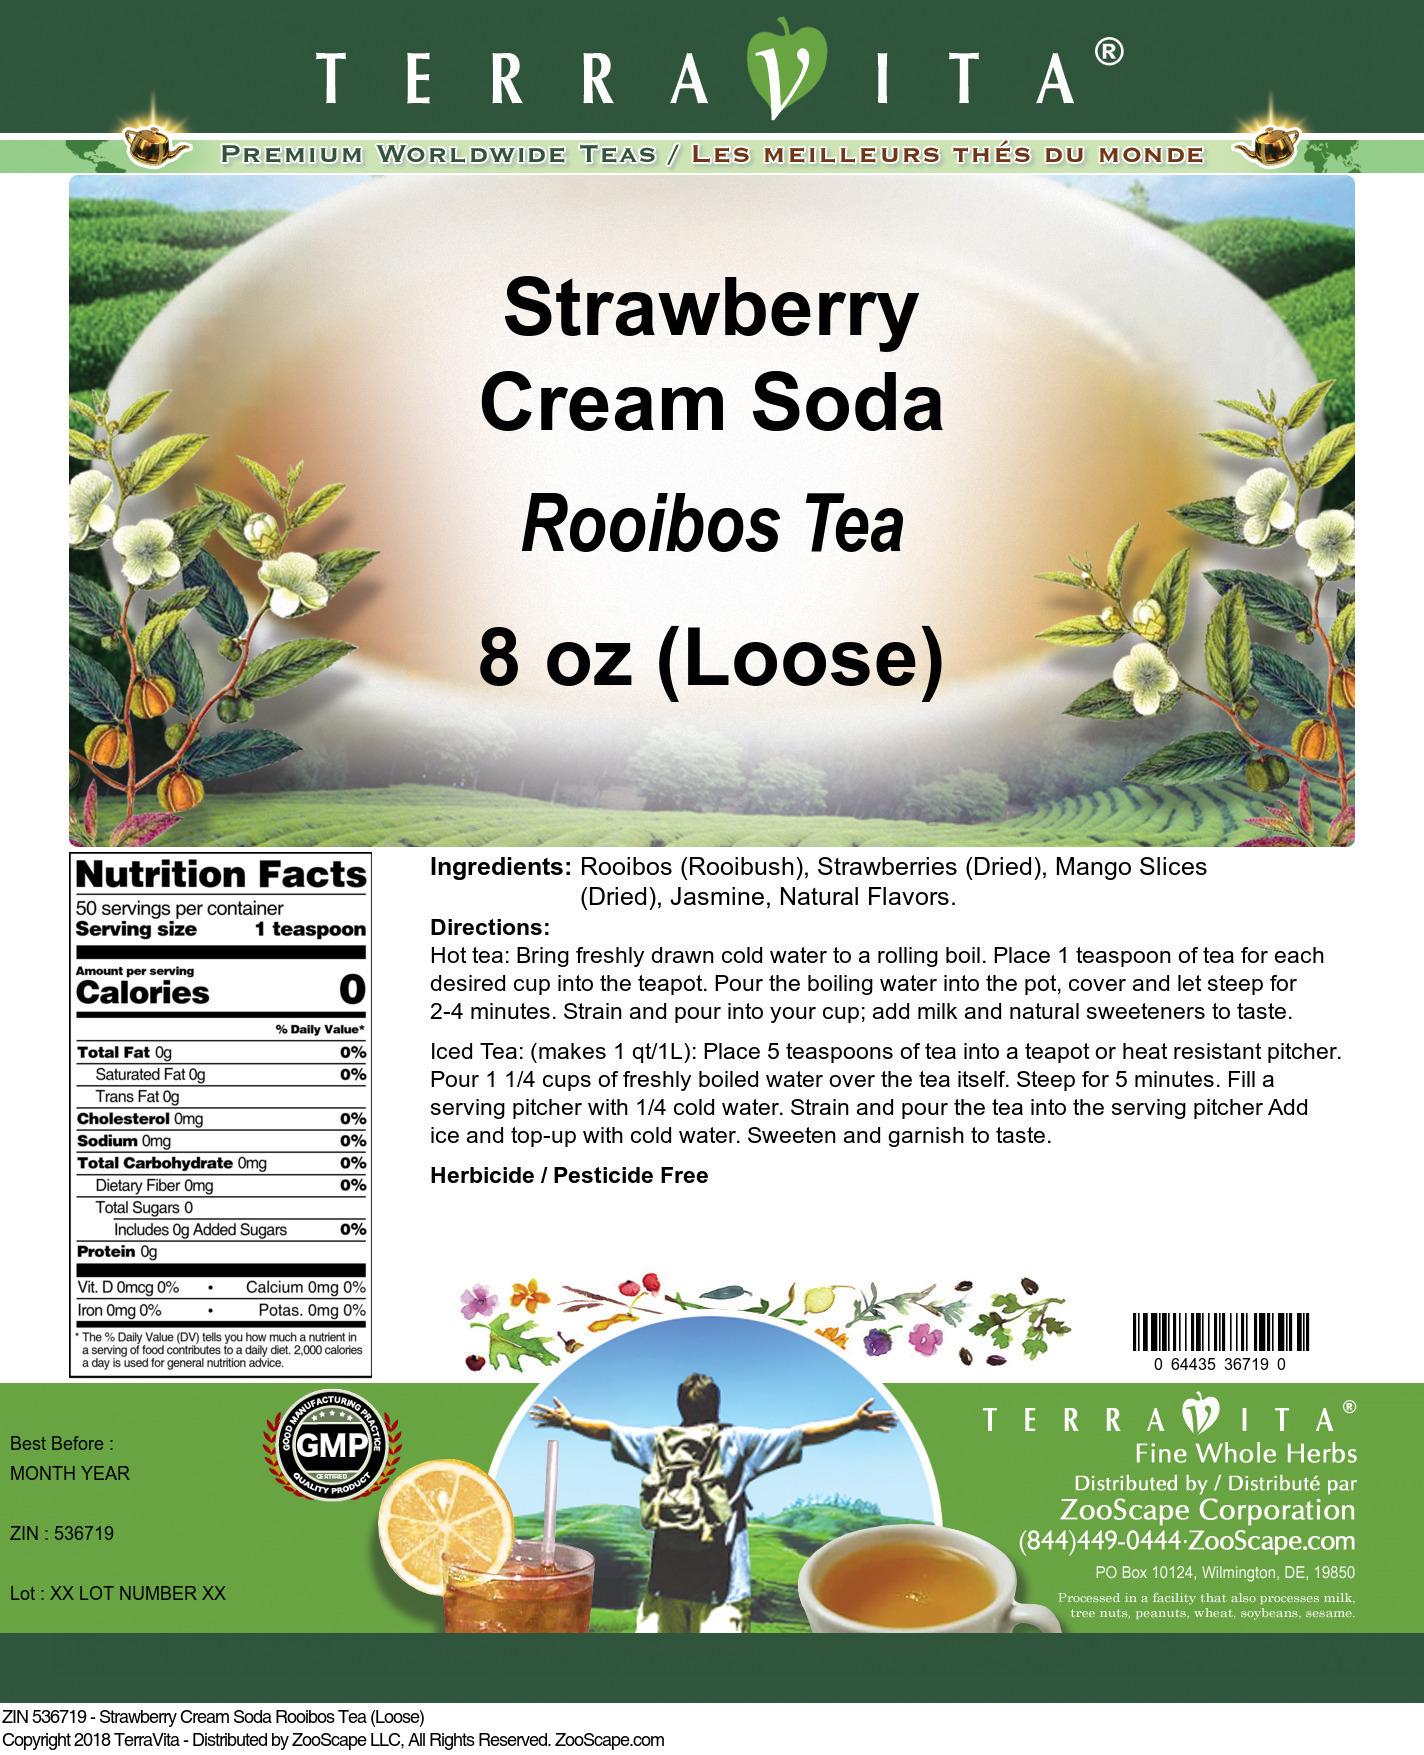 Strawberry Cream Soda Rooibos Tea (Loose)